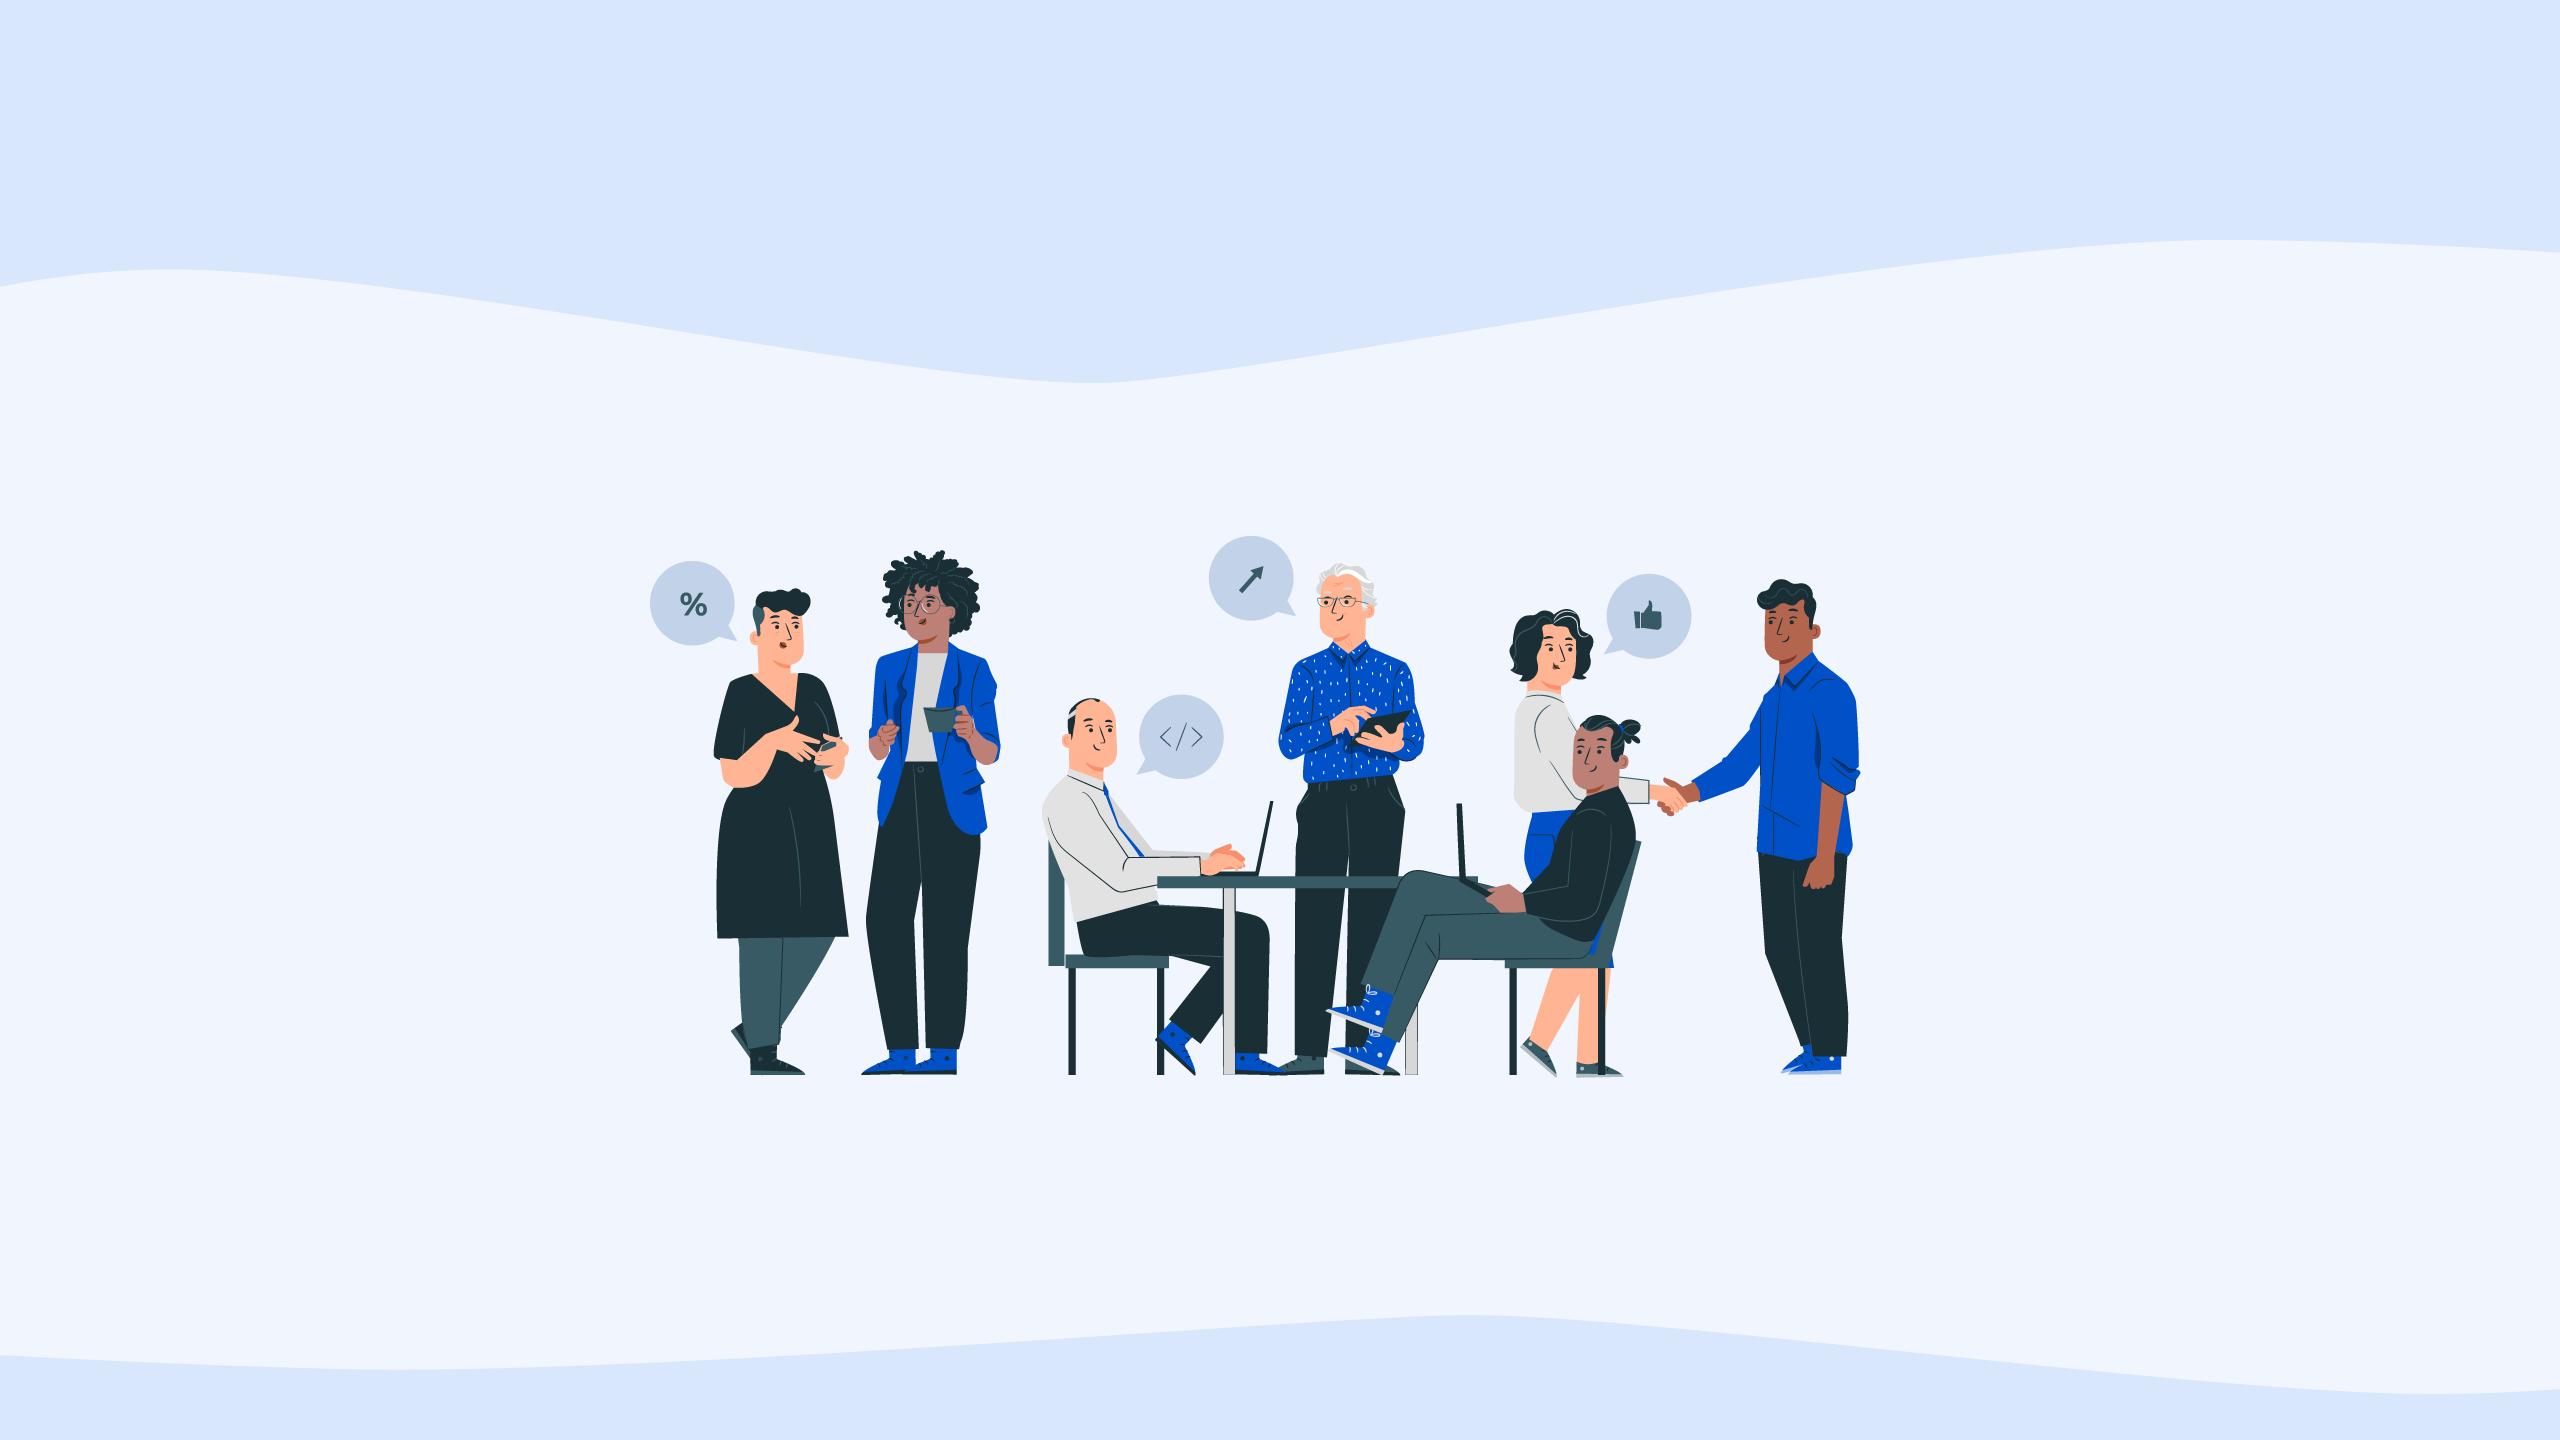 jira teamwork integration